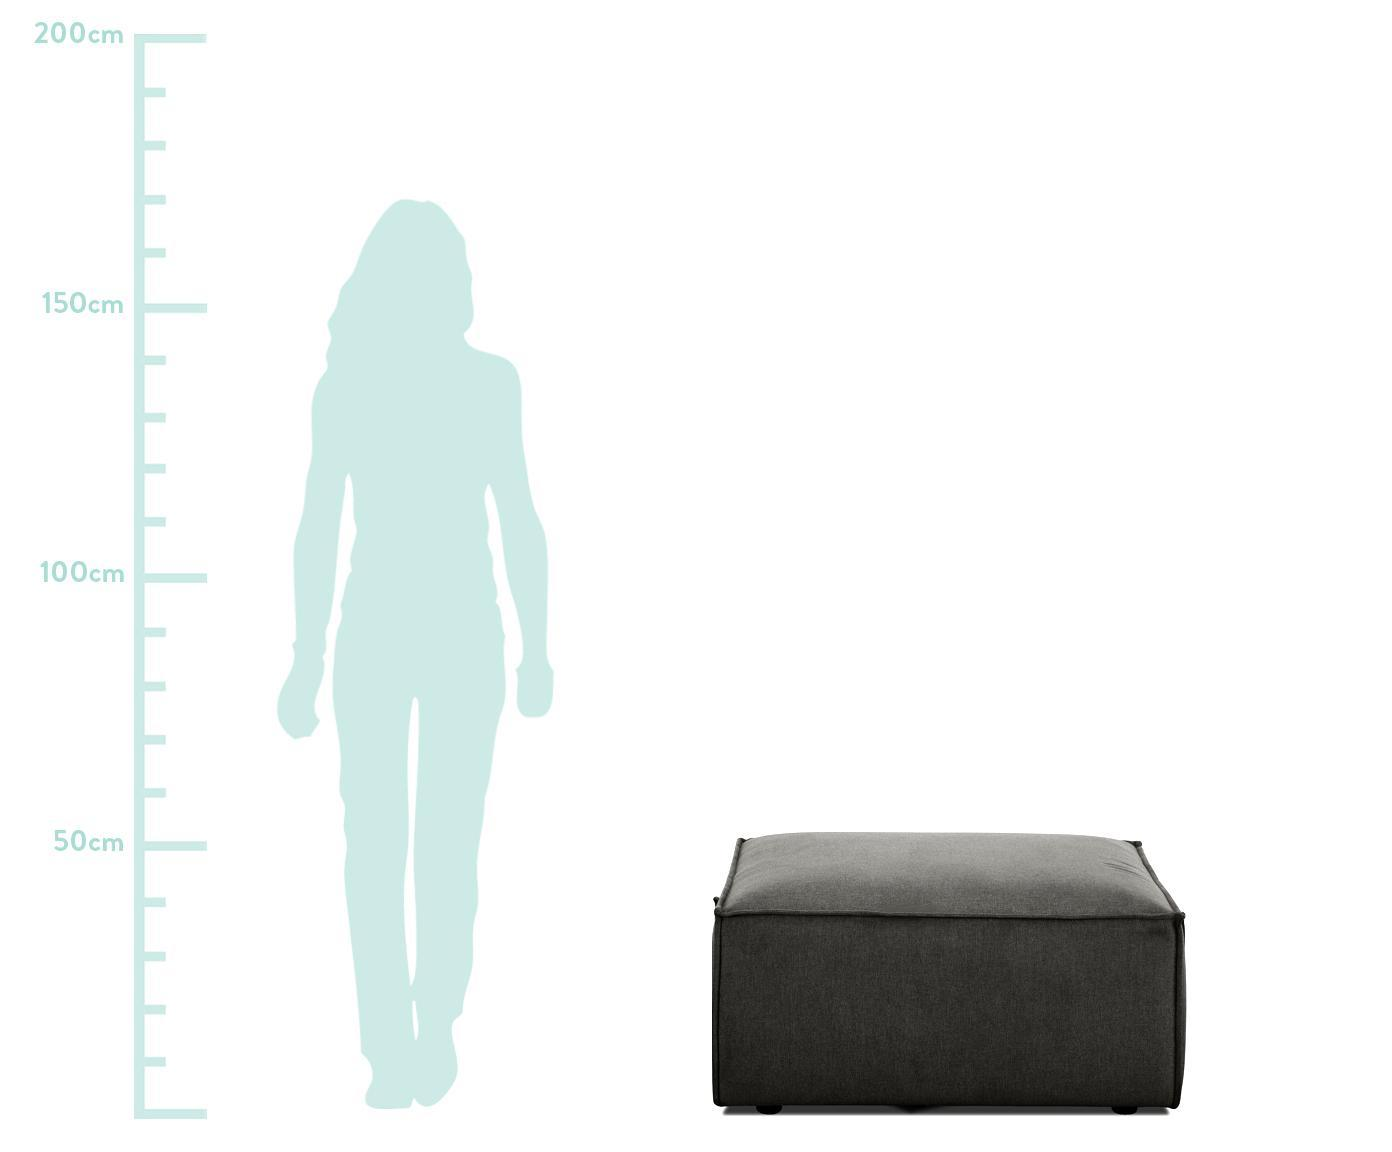 Sofa-Hocker Lennon, Bezug: Polyester Der hochwertige, Gestell: Massives Kiefernholz, Spe, Füße: Kunststoff, Webstoff Anthrazit, 88 x 43 cm